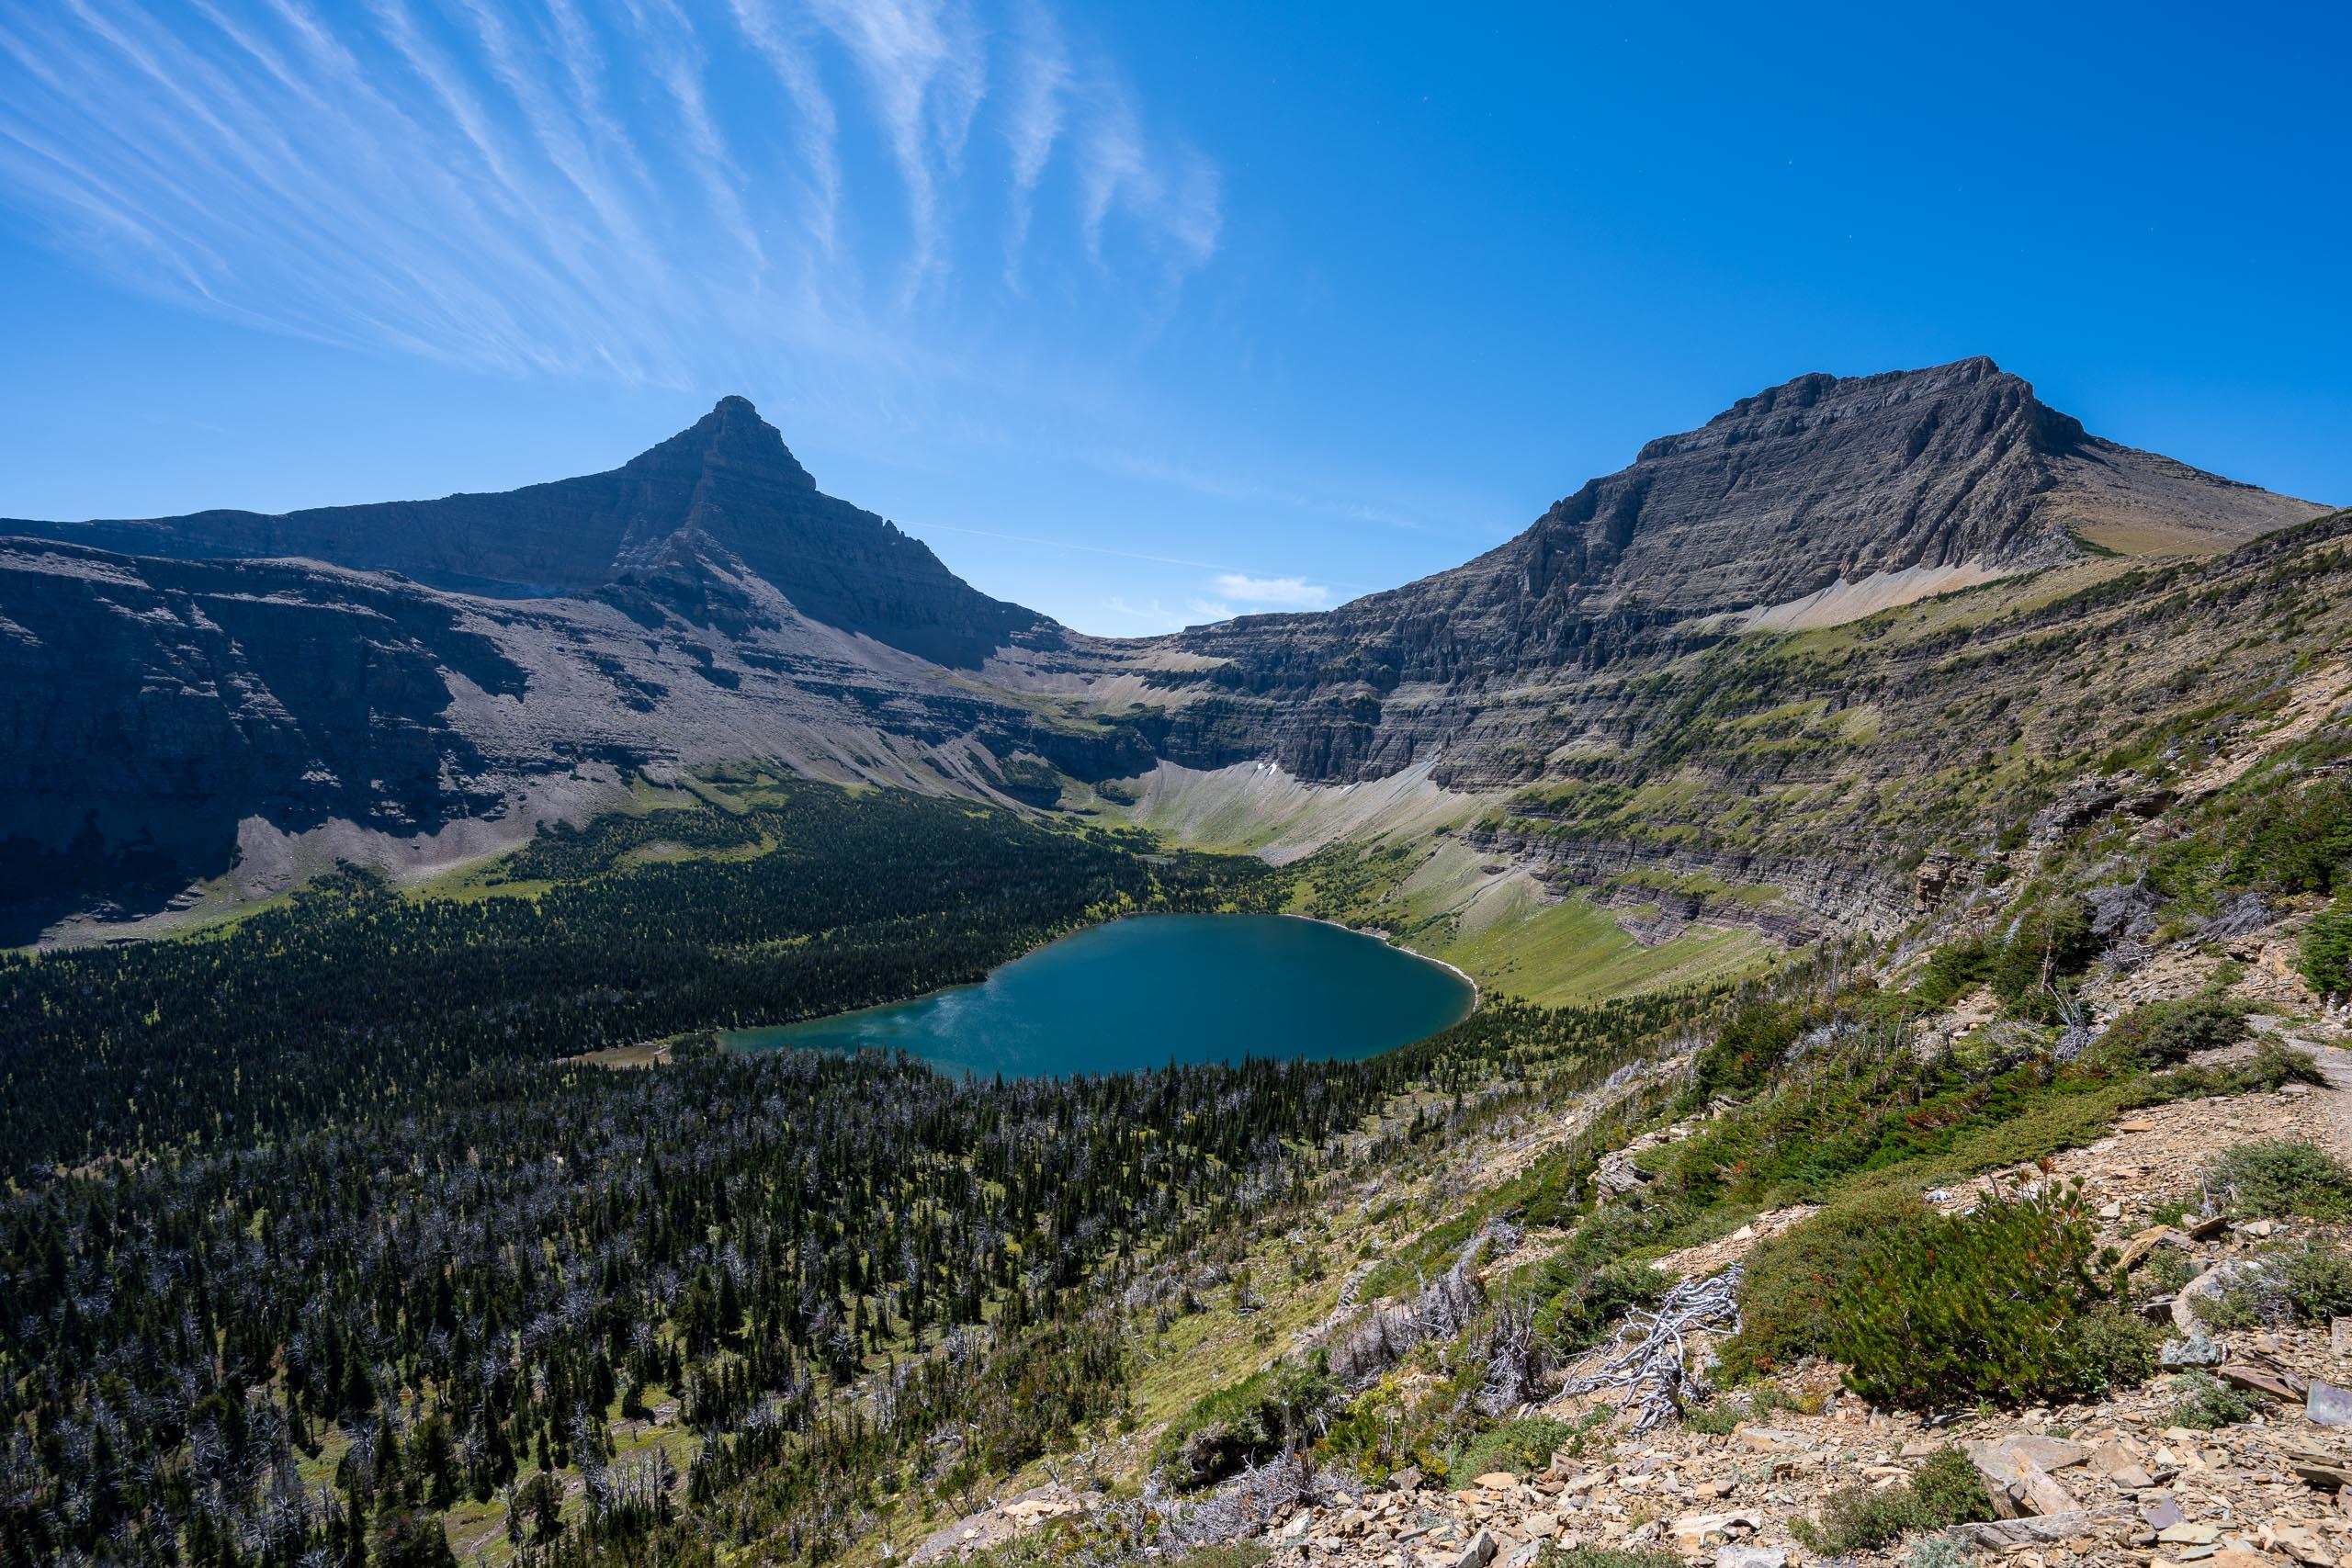 Oldman Lake, Flinsch Peak, Mt. Morgan